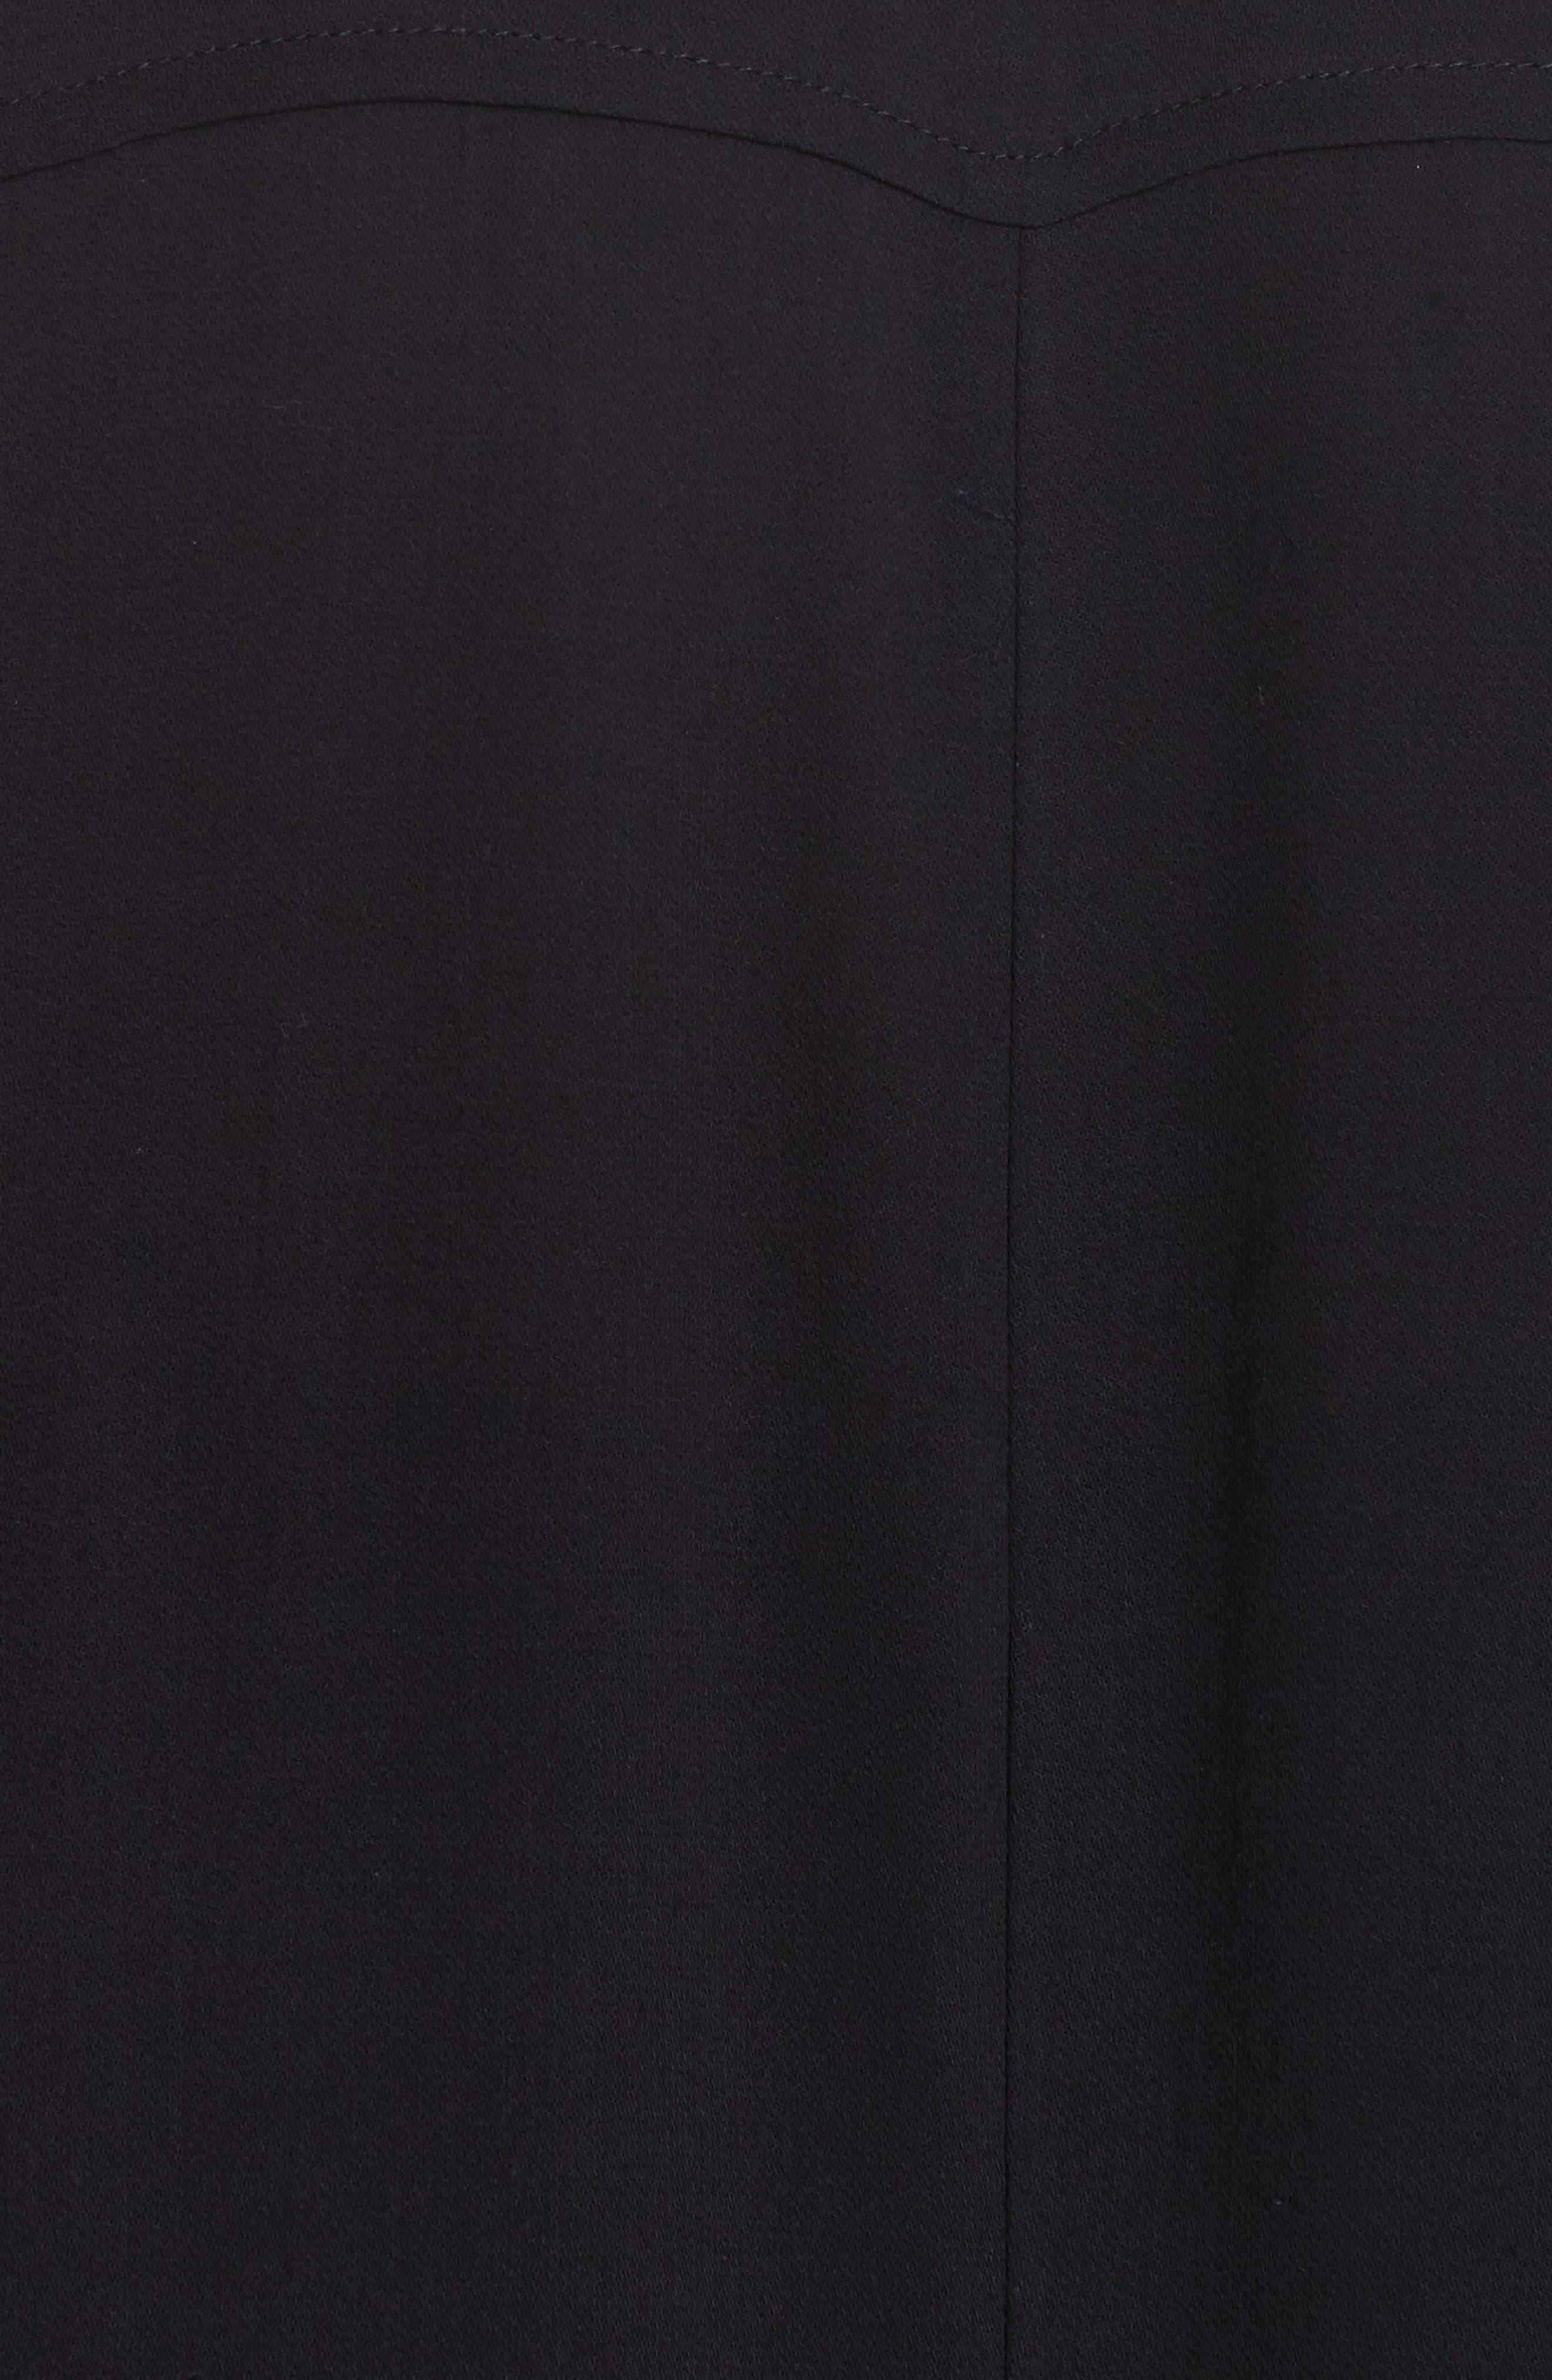 Maxi Shirtdress,                             Alternate thumbnail 6, color,                             Noir